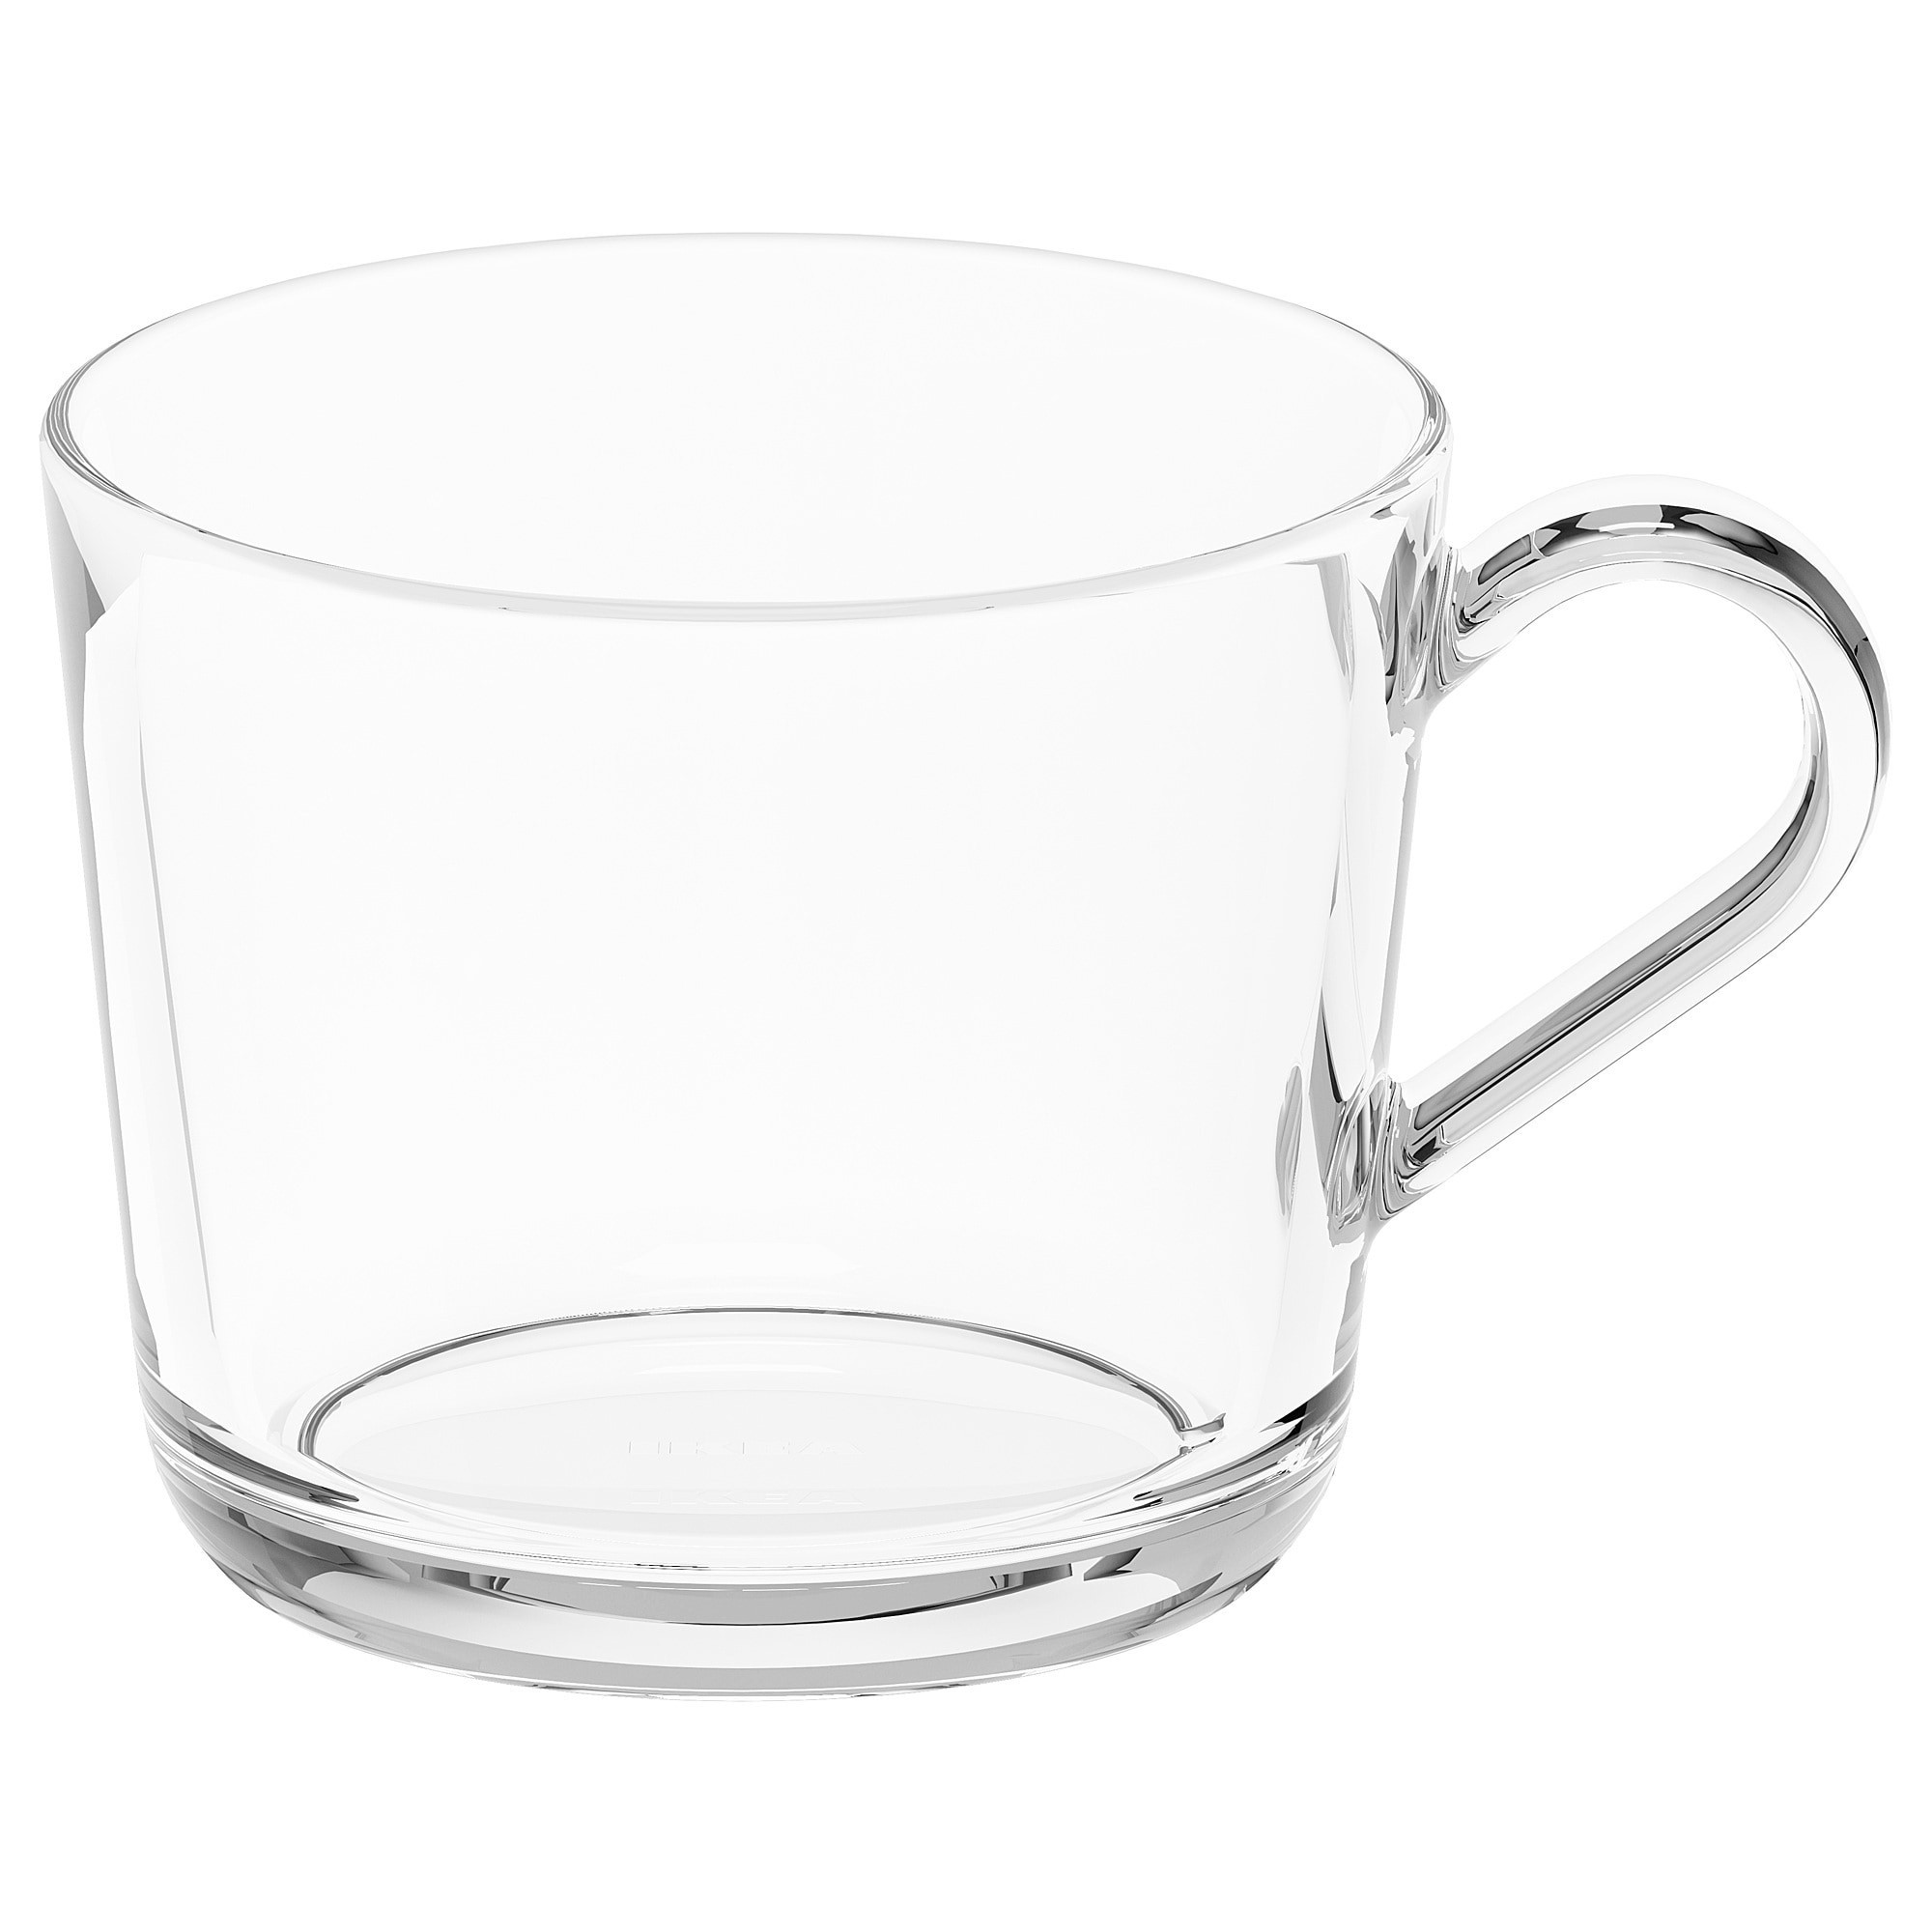 ИКЕА/365+ Кружка прозрачное стекло,240 мл